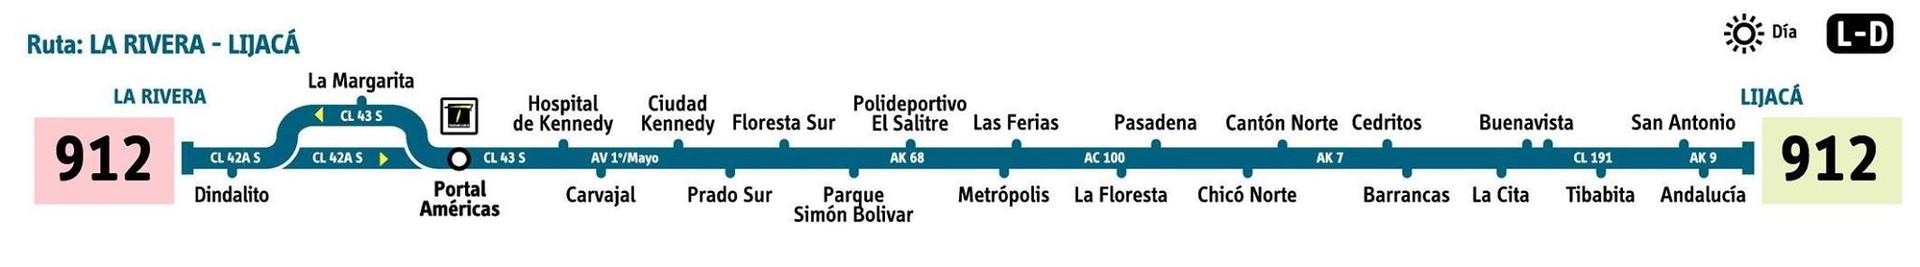 Ruta SITP: 912 Lijacá ↔ La Rivera [Urbana] 2